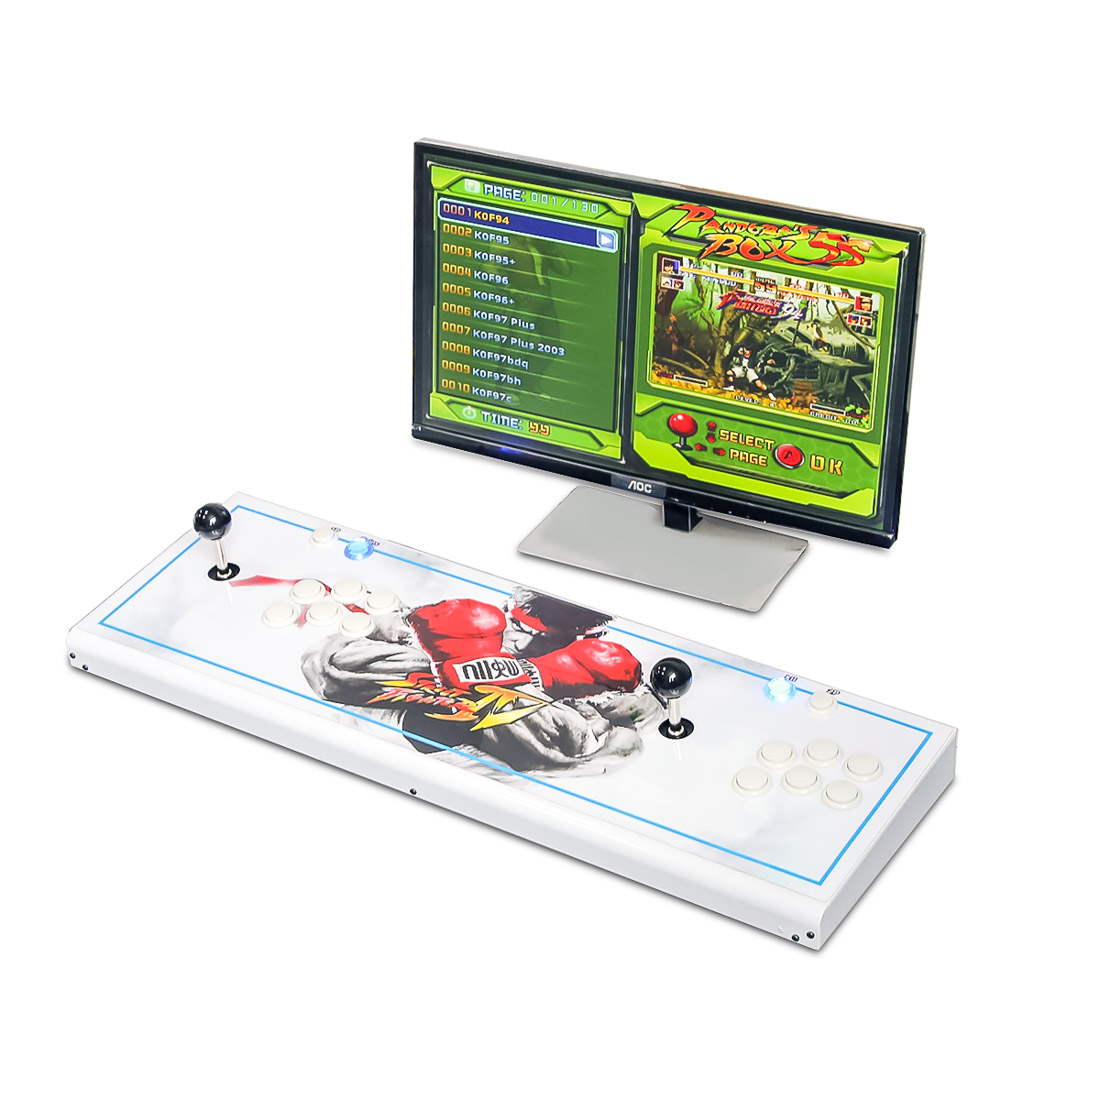 Ryu Design Pandora's Box Game Pad